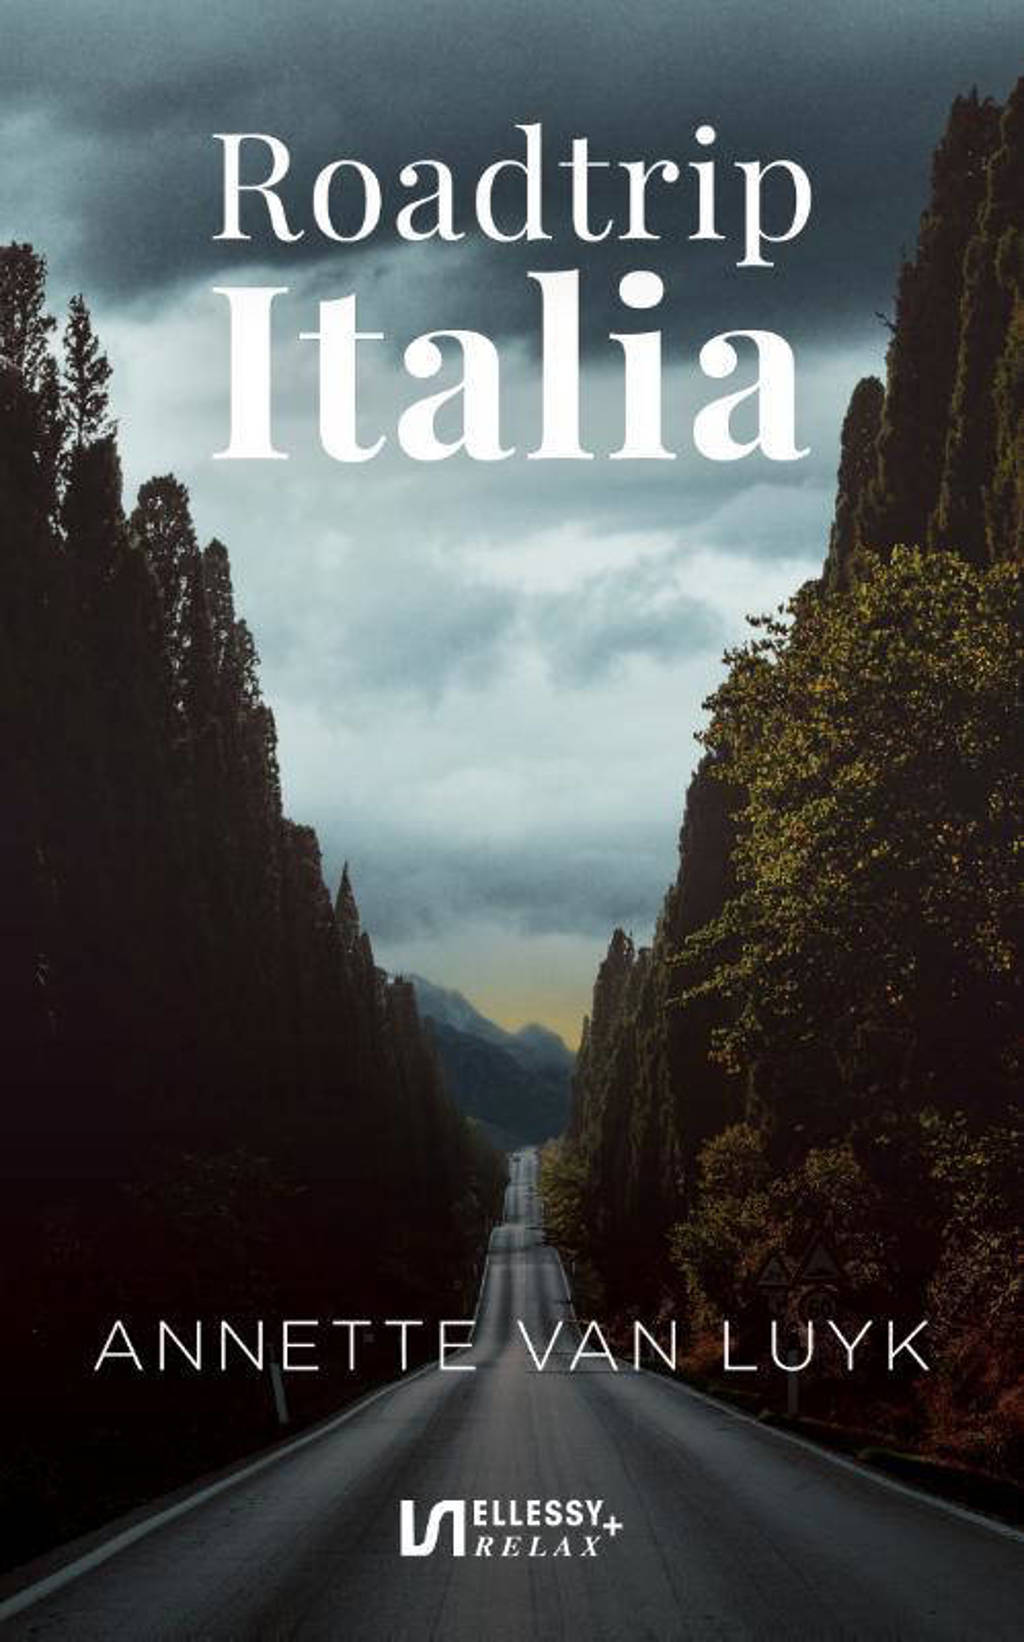 Roadtrip Italia - Annette van Luyk